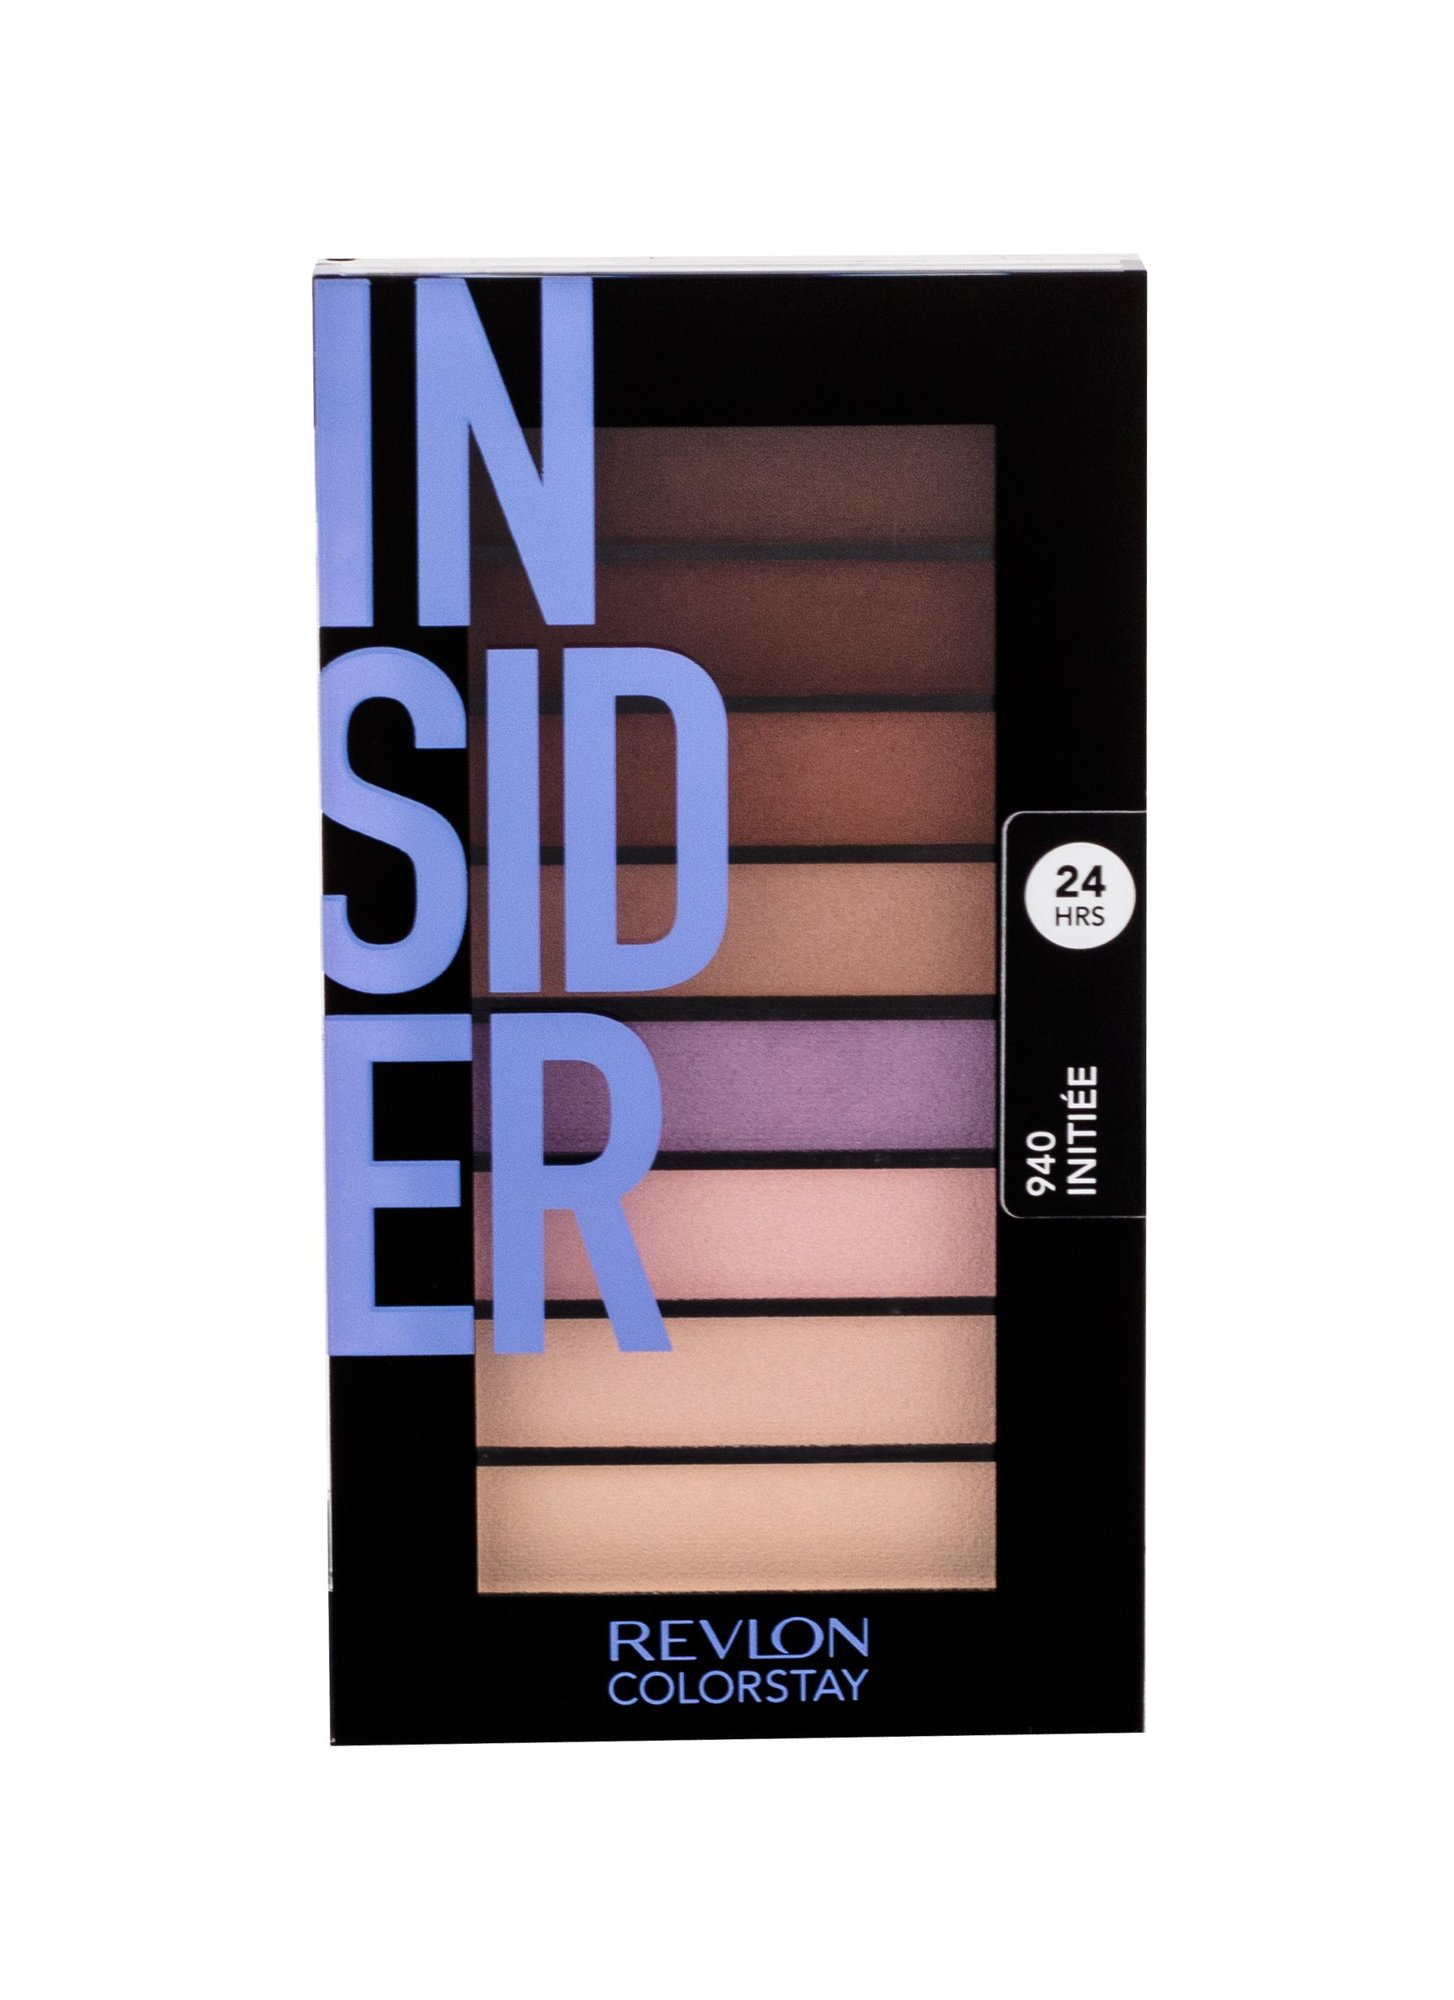 Revlon Colorstay Eye Shadow 3,4ml 940 Insider